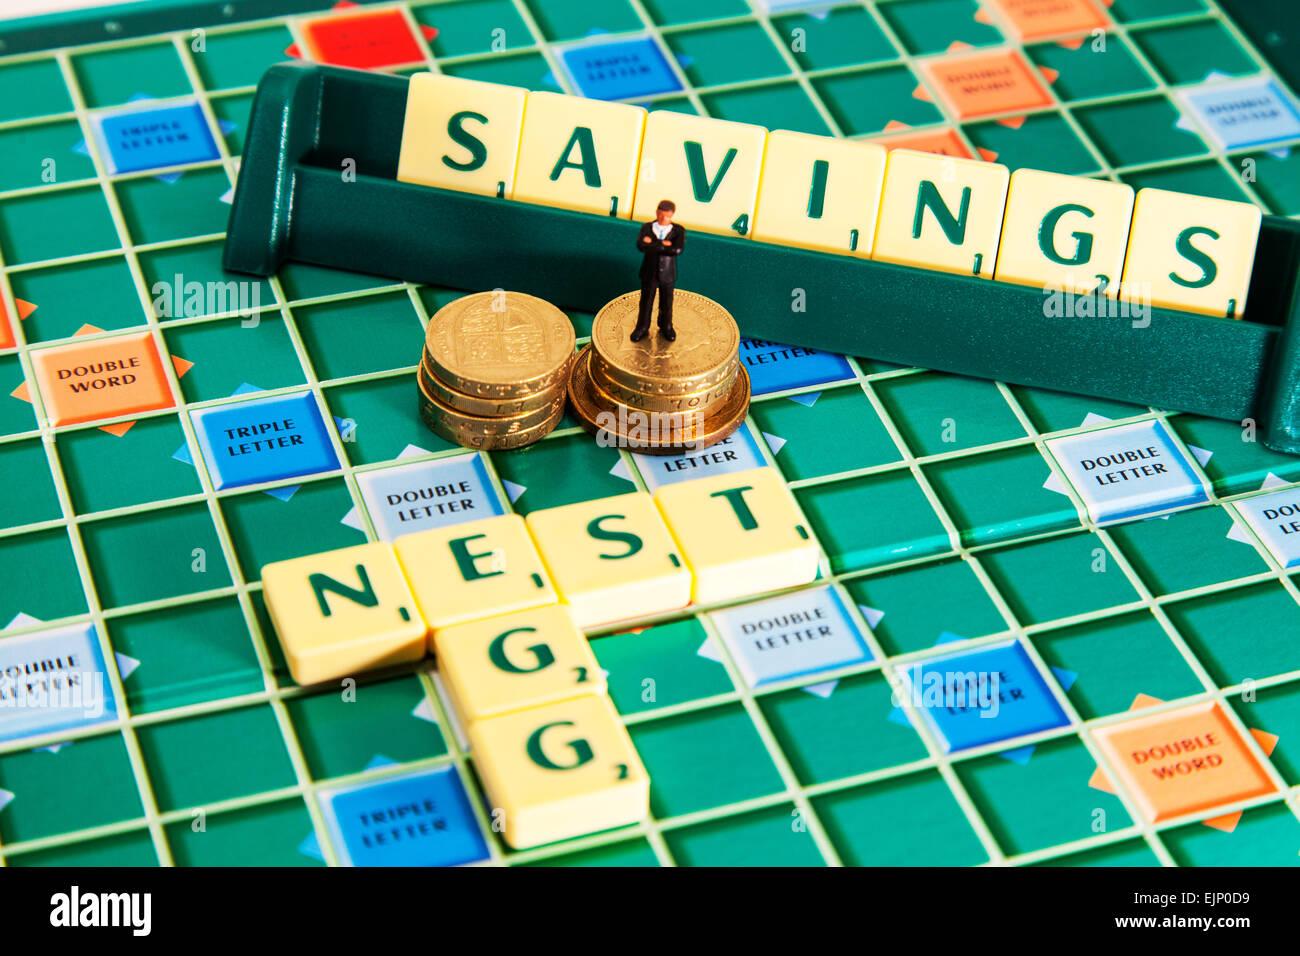 nest egg savings money saving pension investment investing words using scrabble tiles to illustrate spelling spell - Stock Image